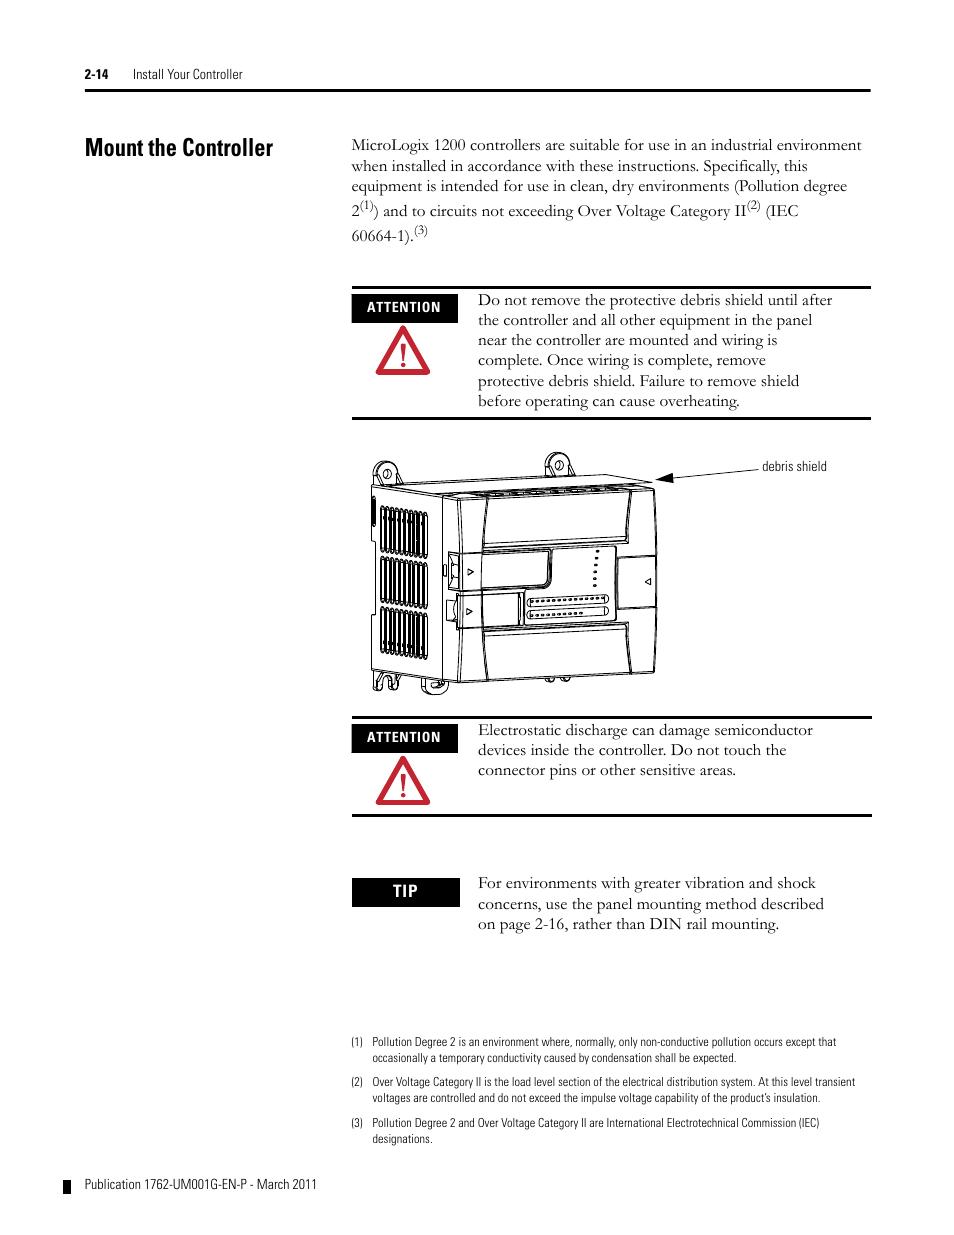 Mount the controller, Mount the controller -14 | Rockwell Automation ...